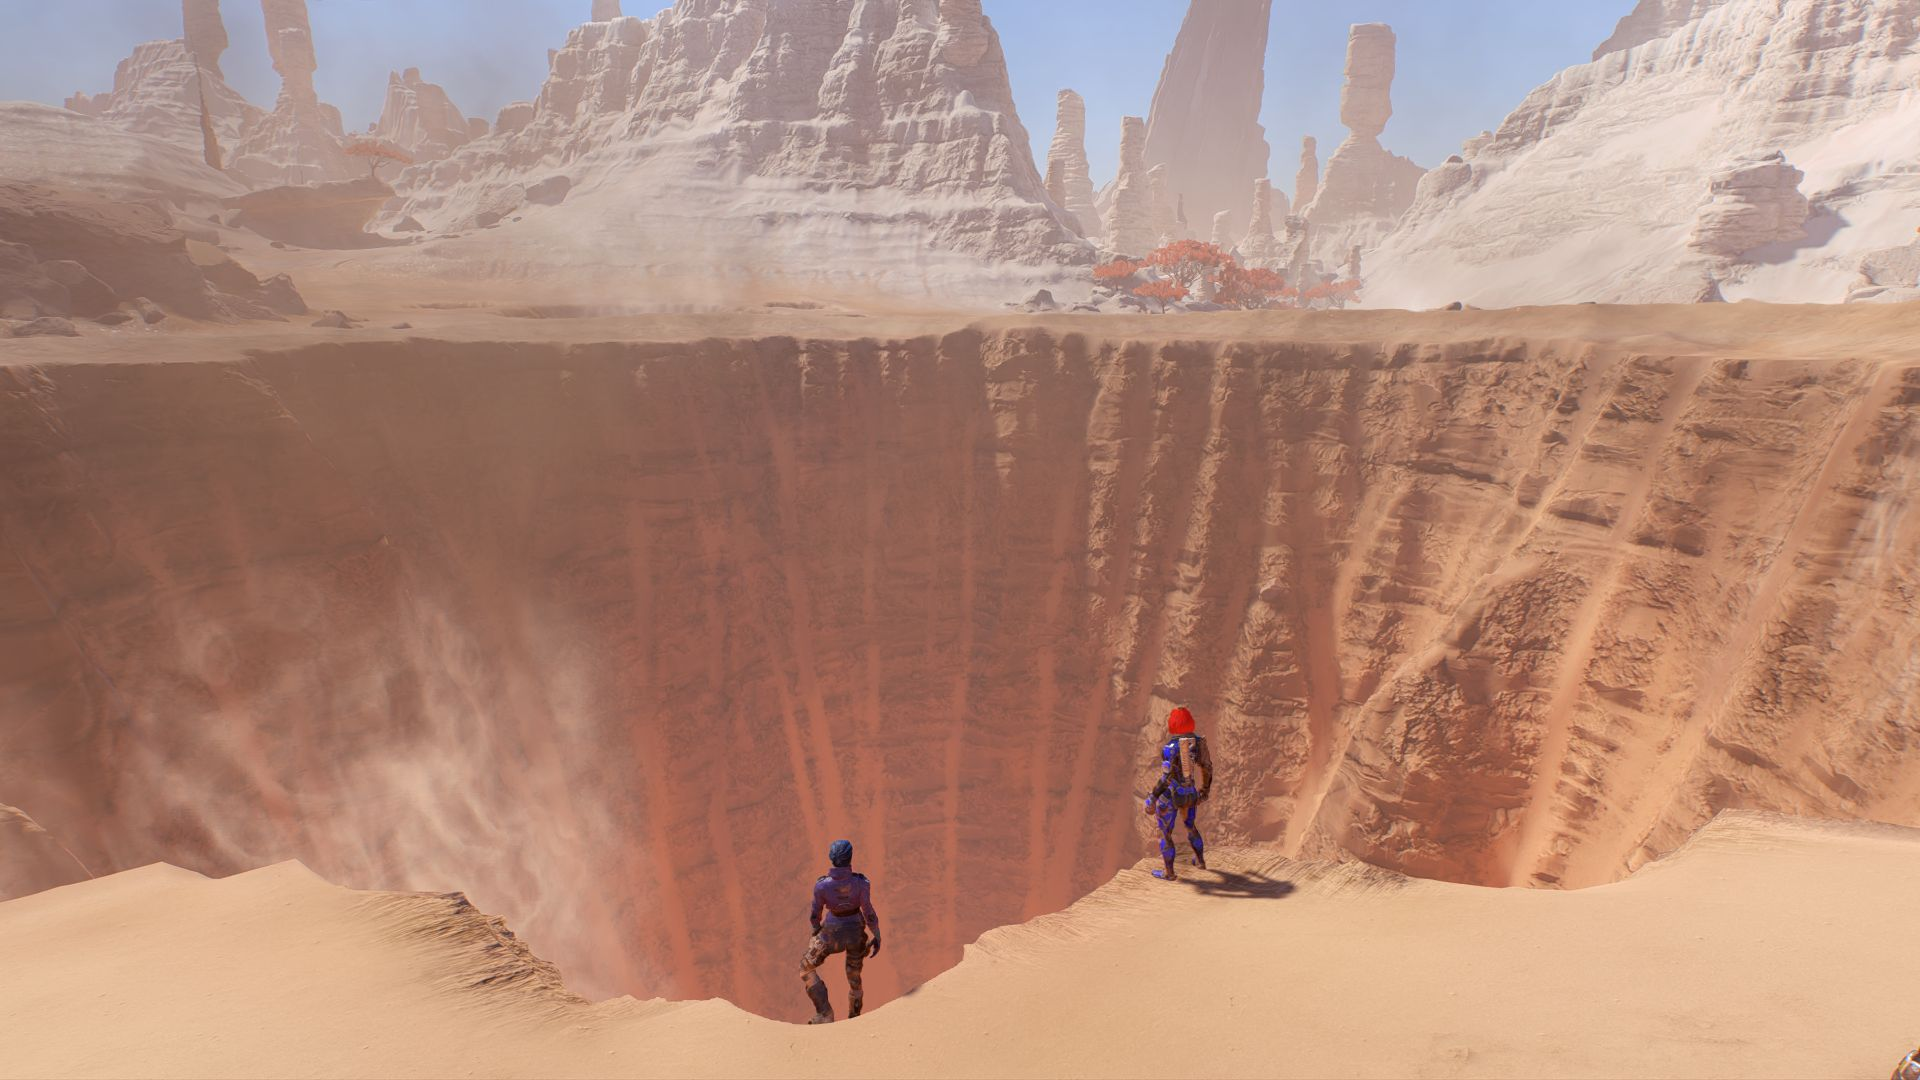 Mass Effect Andromeda Screenshot 2017.07.26 - 20.09.58.66.jpg - Mass Effect: Andromeda